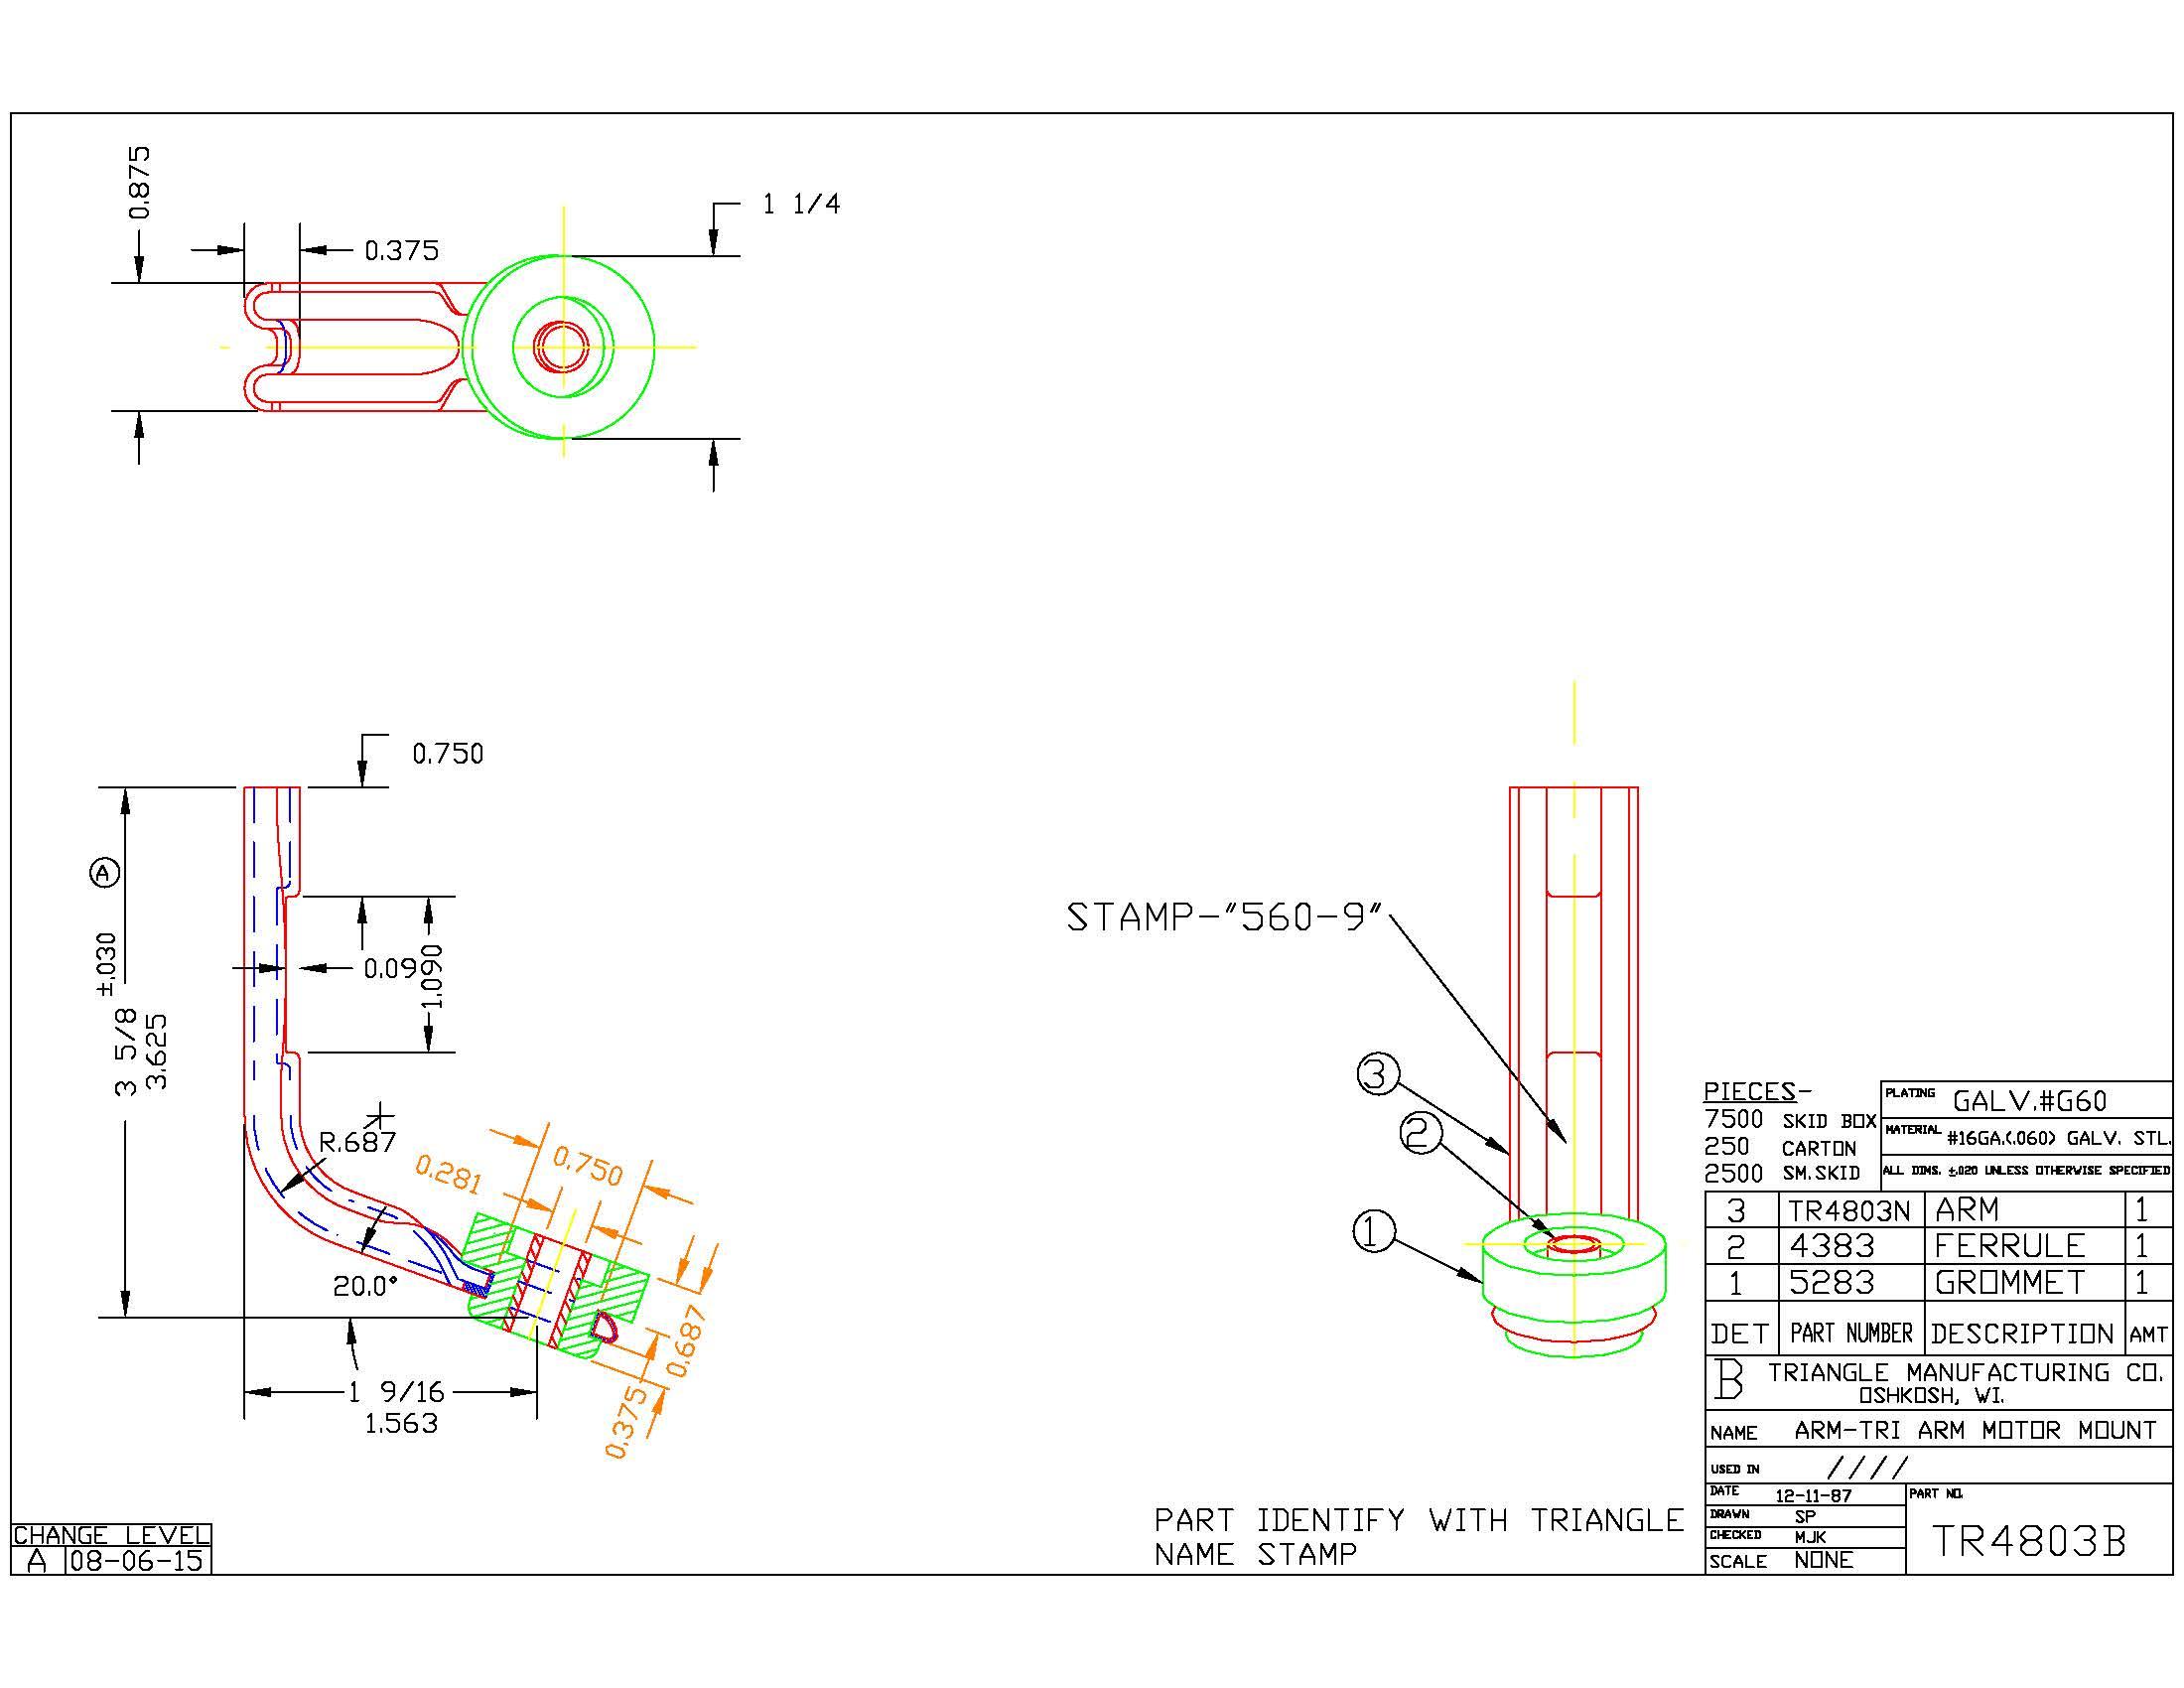 Motor Mount Arm TR4803B